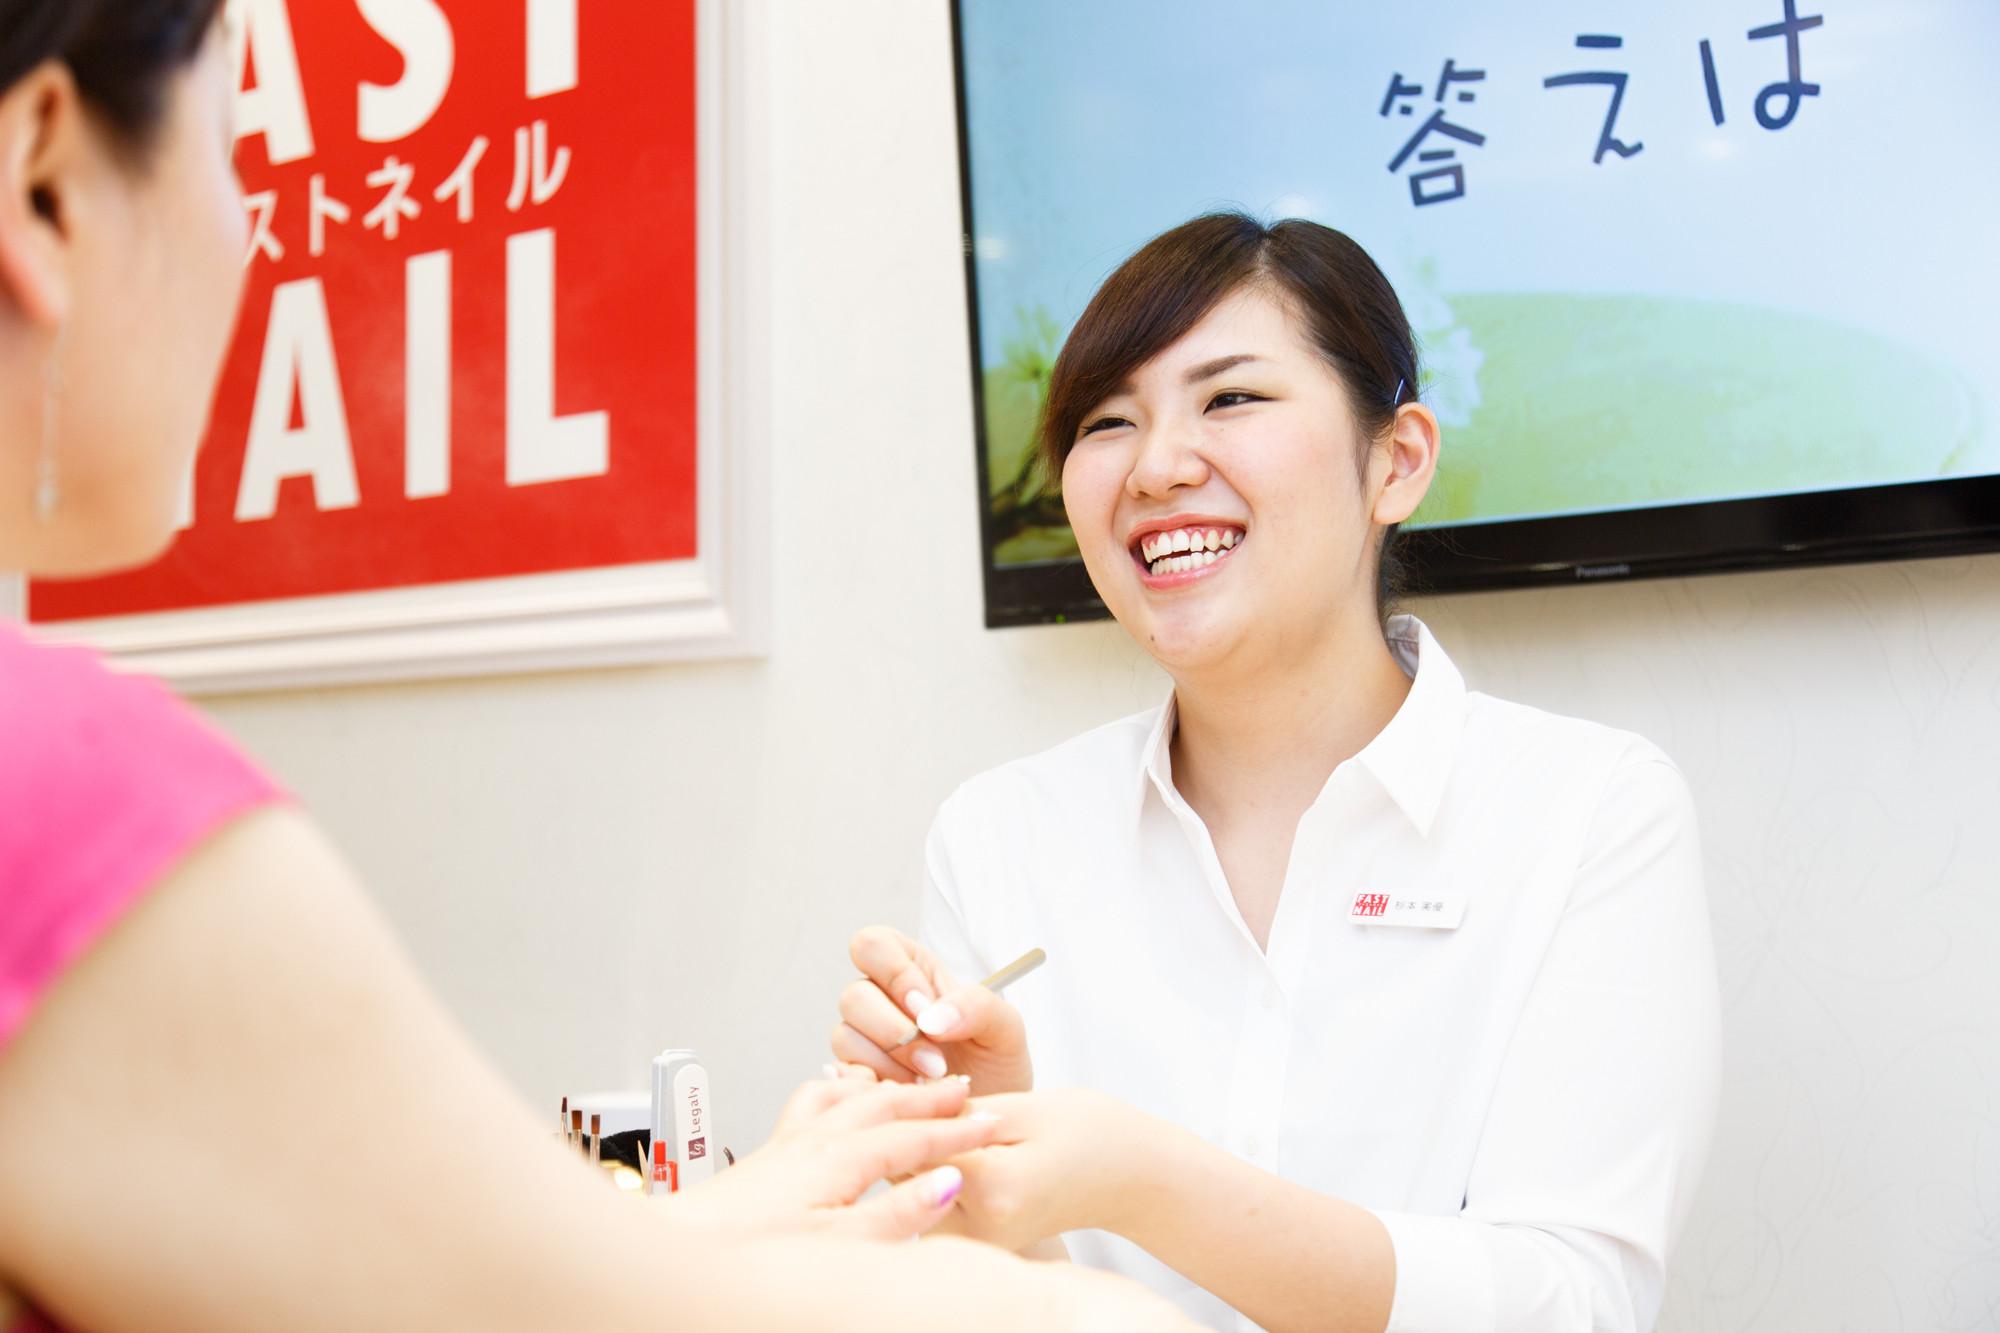 FASTNAIL(ファストネイル) 錦糸町店 のアルバイト情報